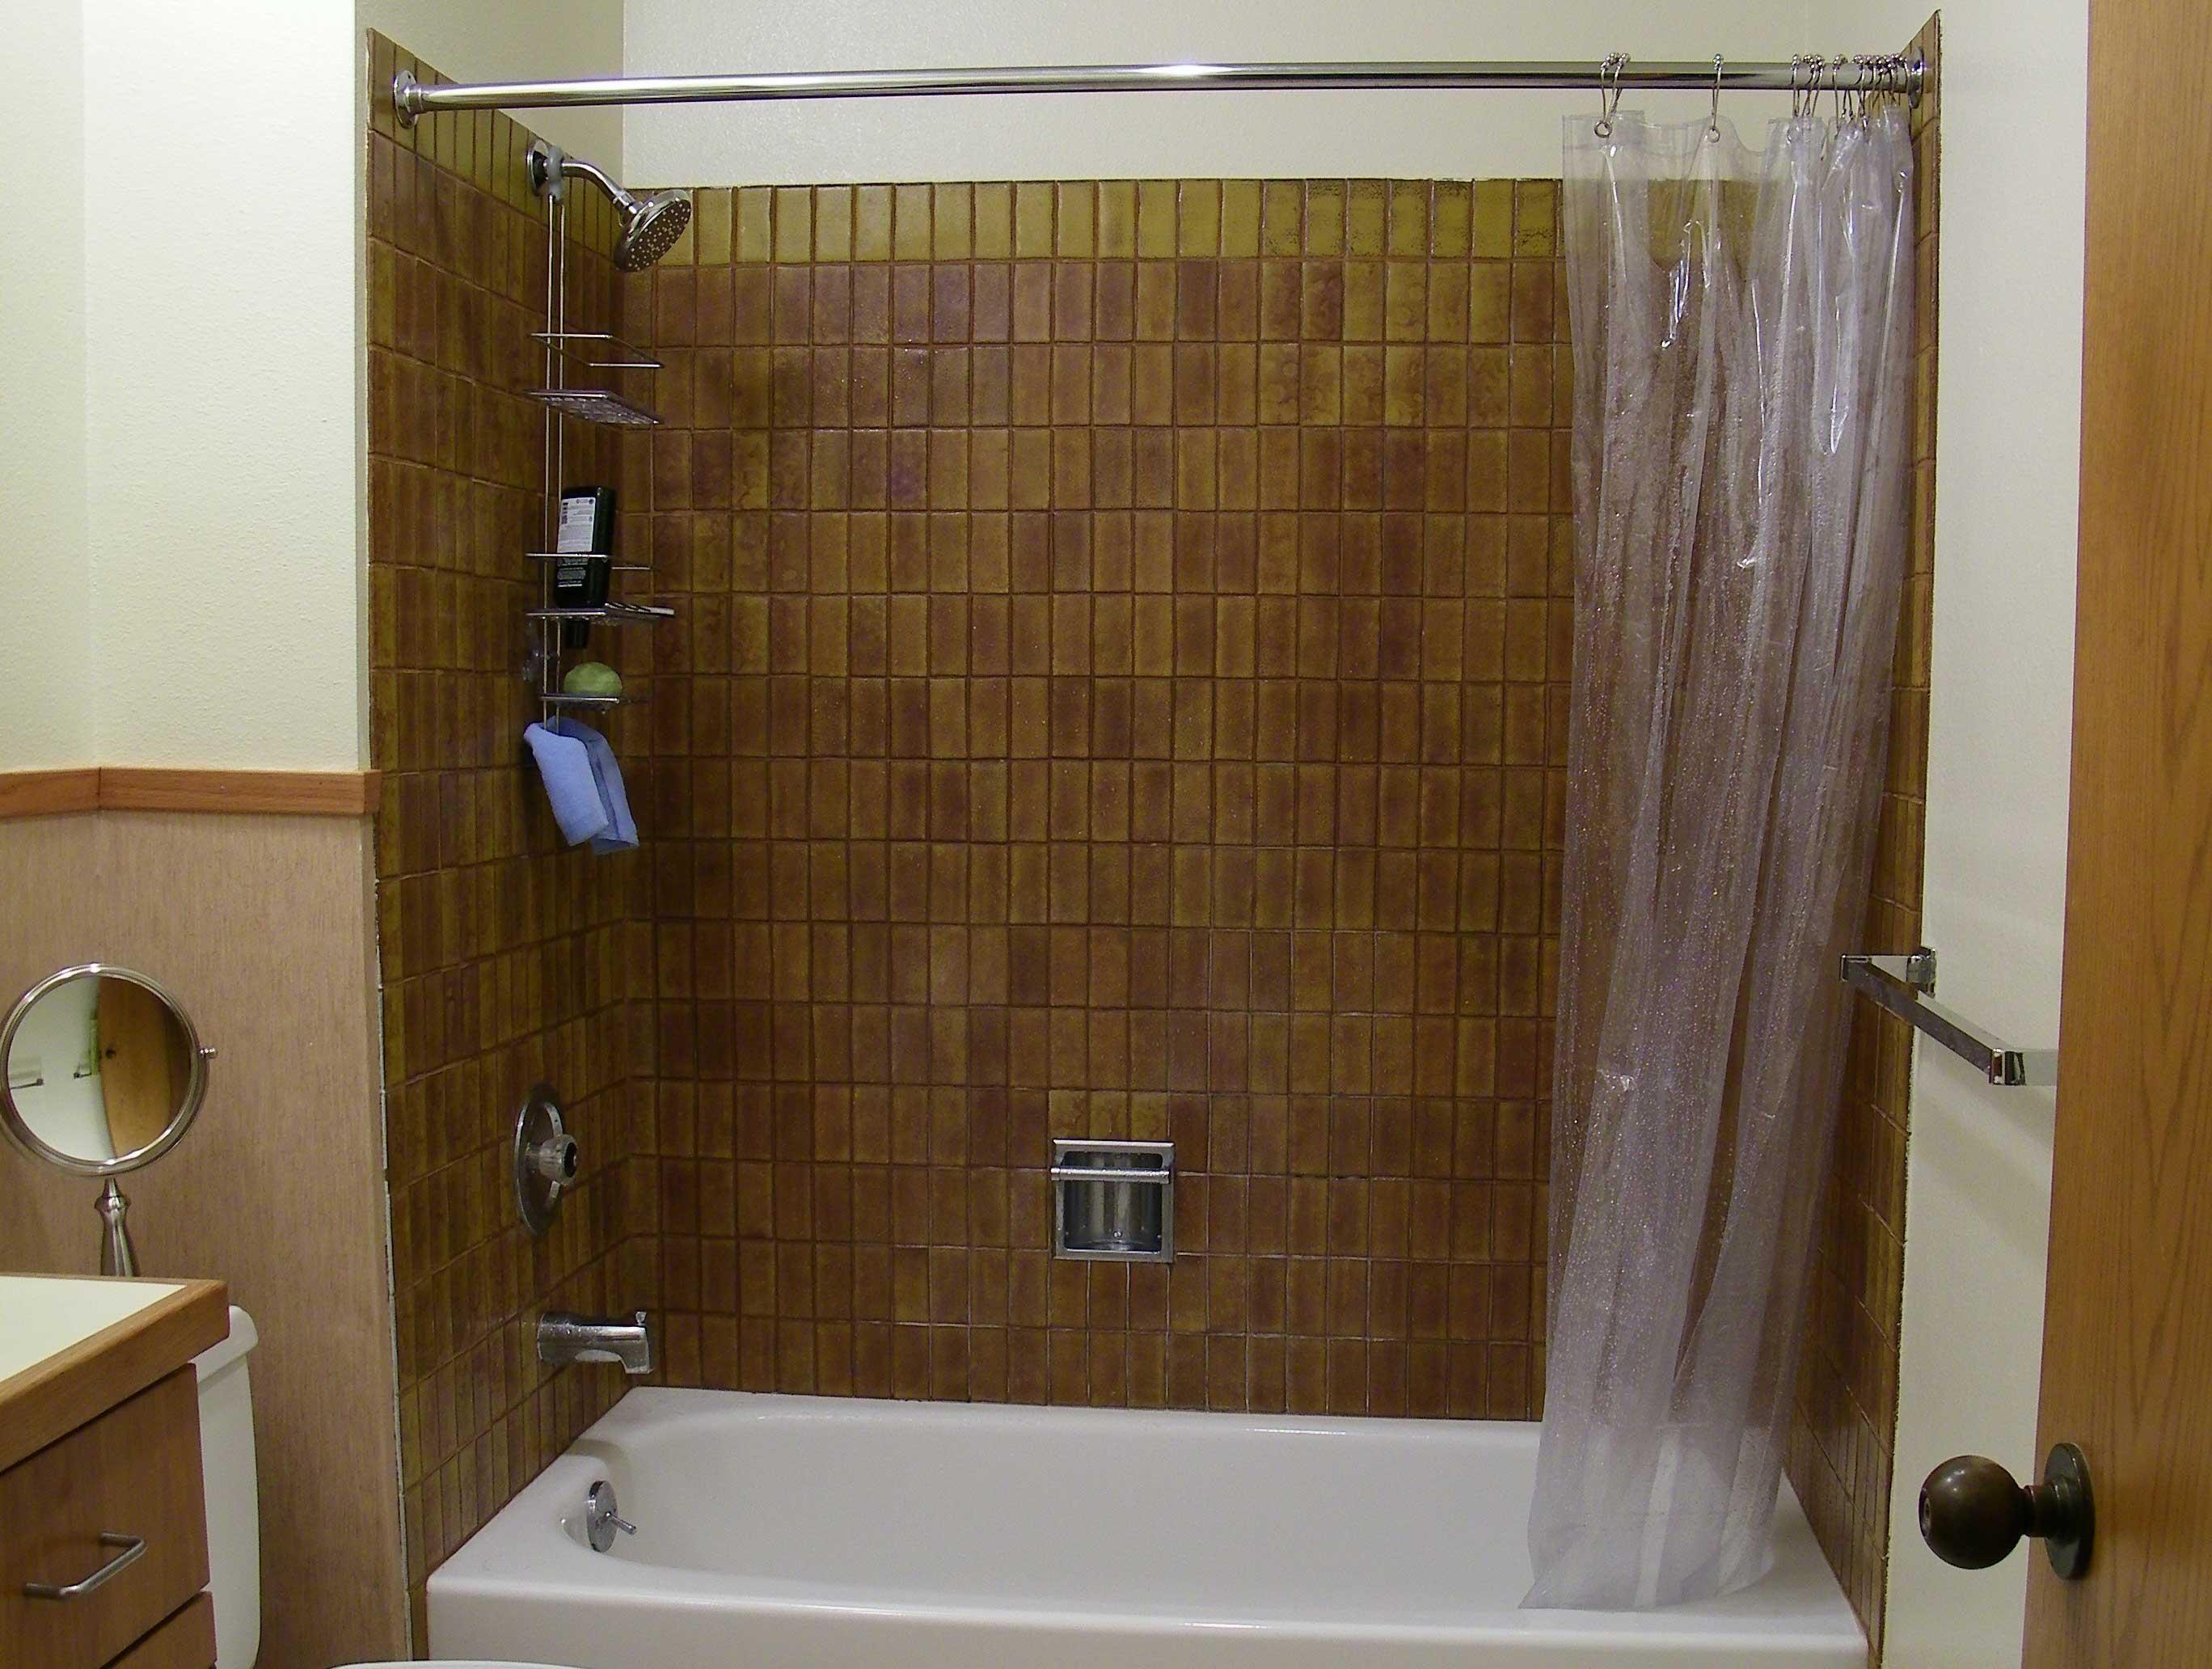 Shower before remodel